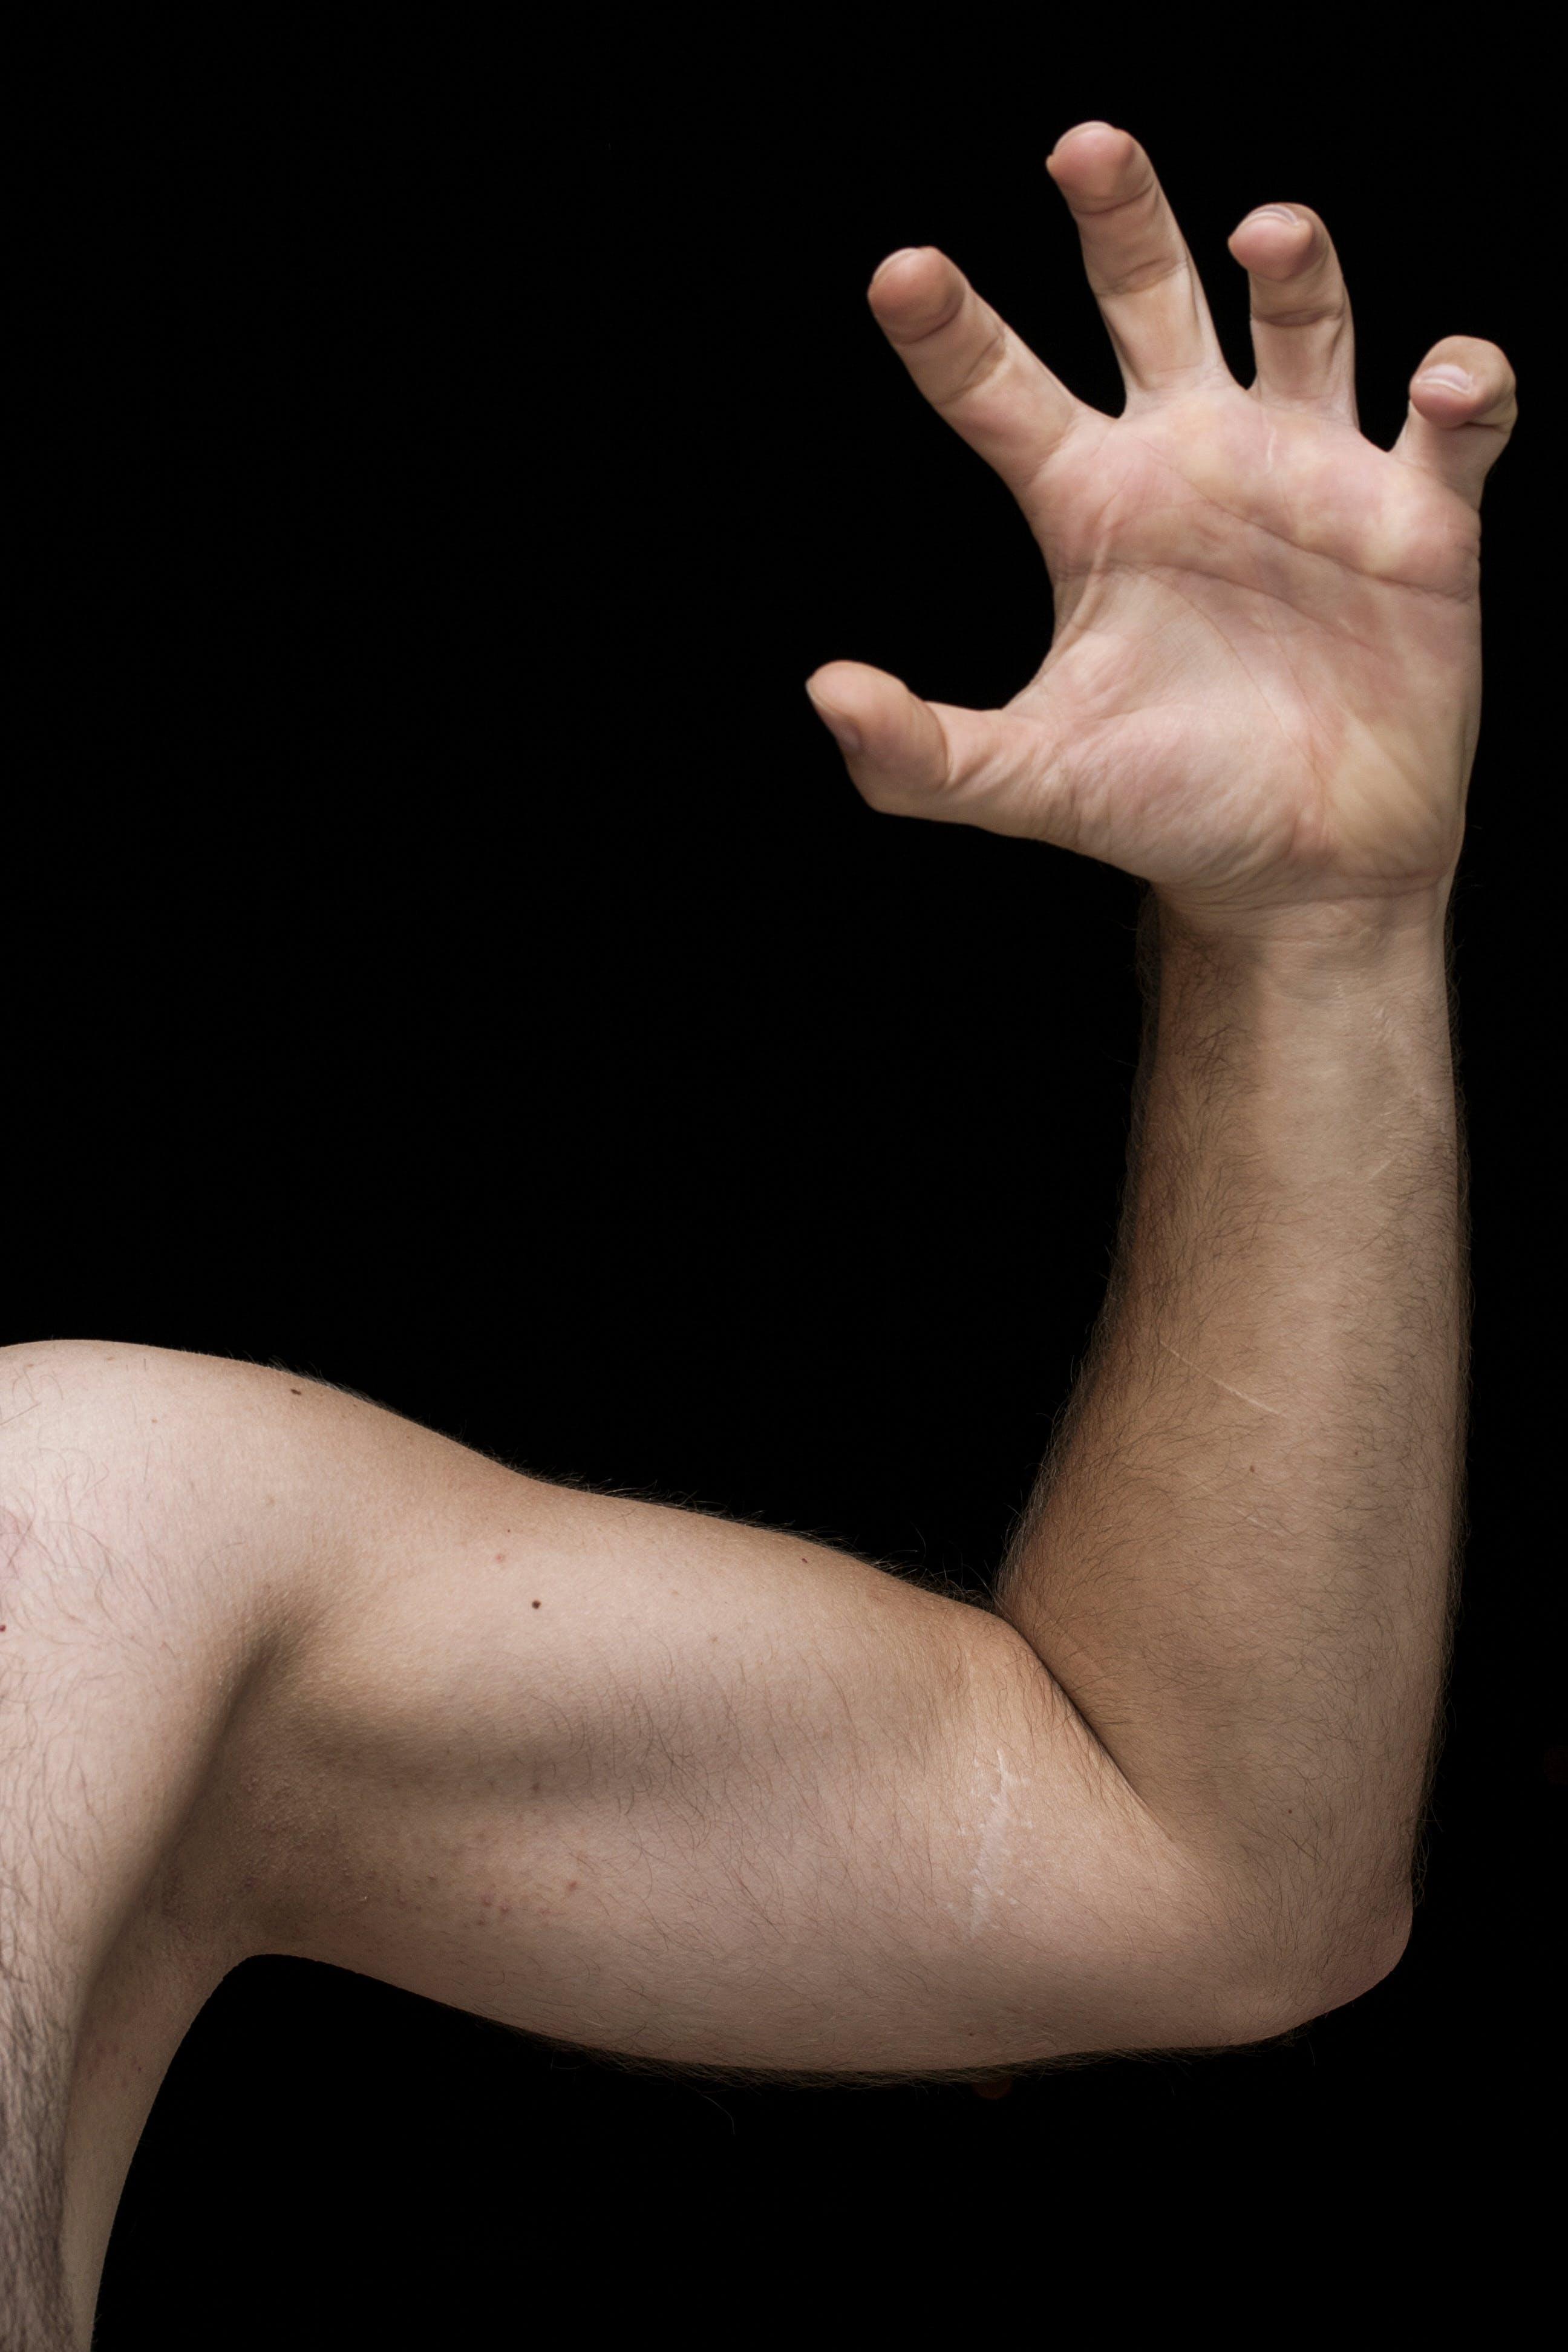 arm, biceps, fingers